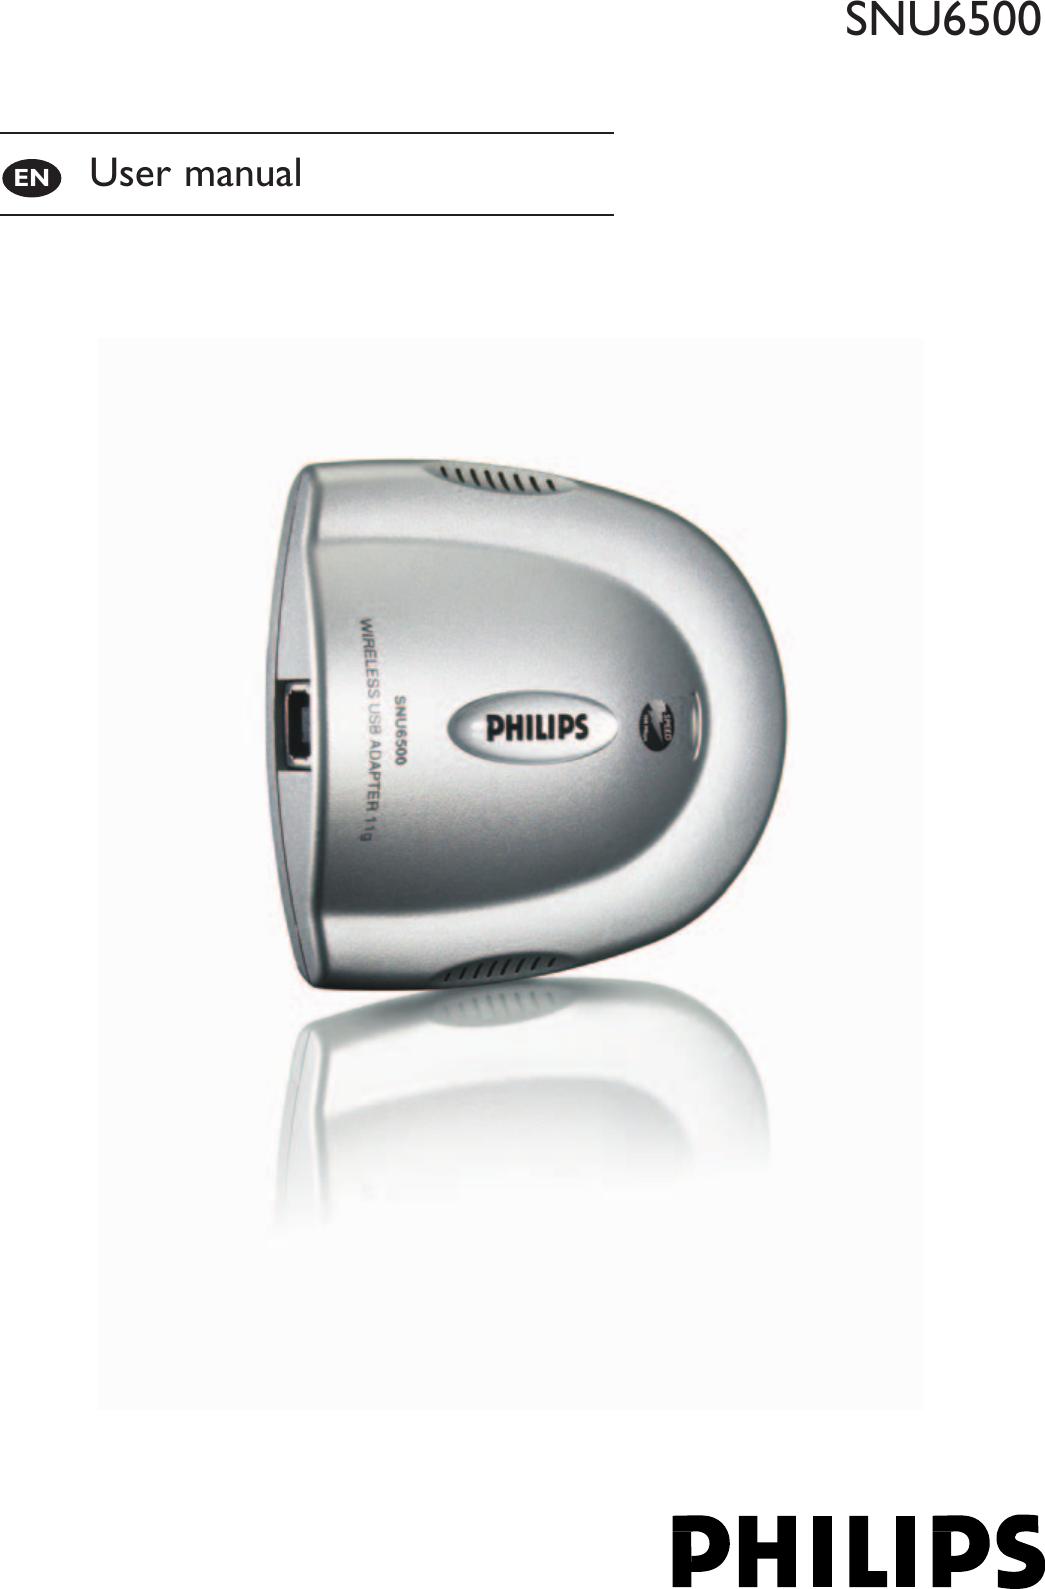 Arcadyan Technology WN4501M WIRELESS USB ADAPTER 11g User